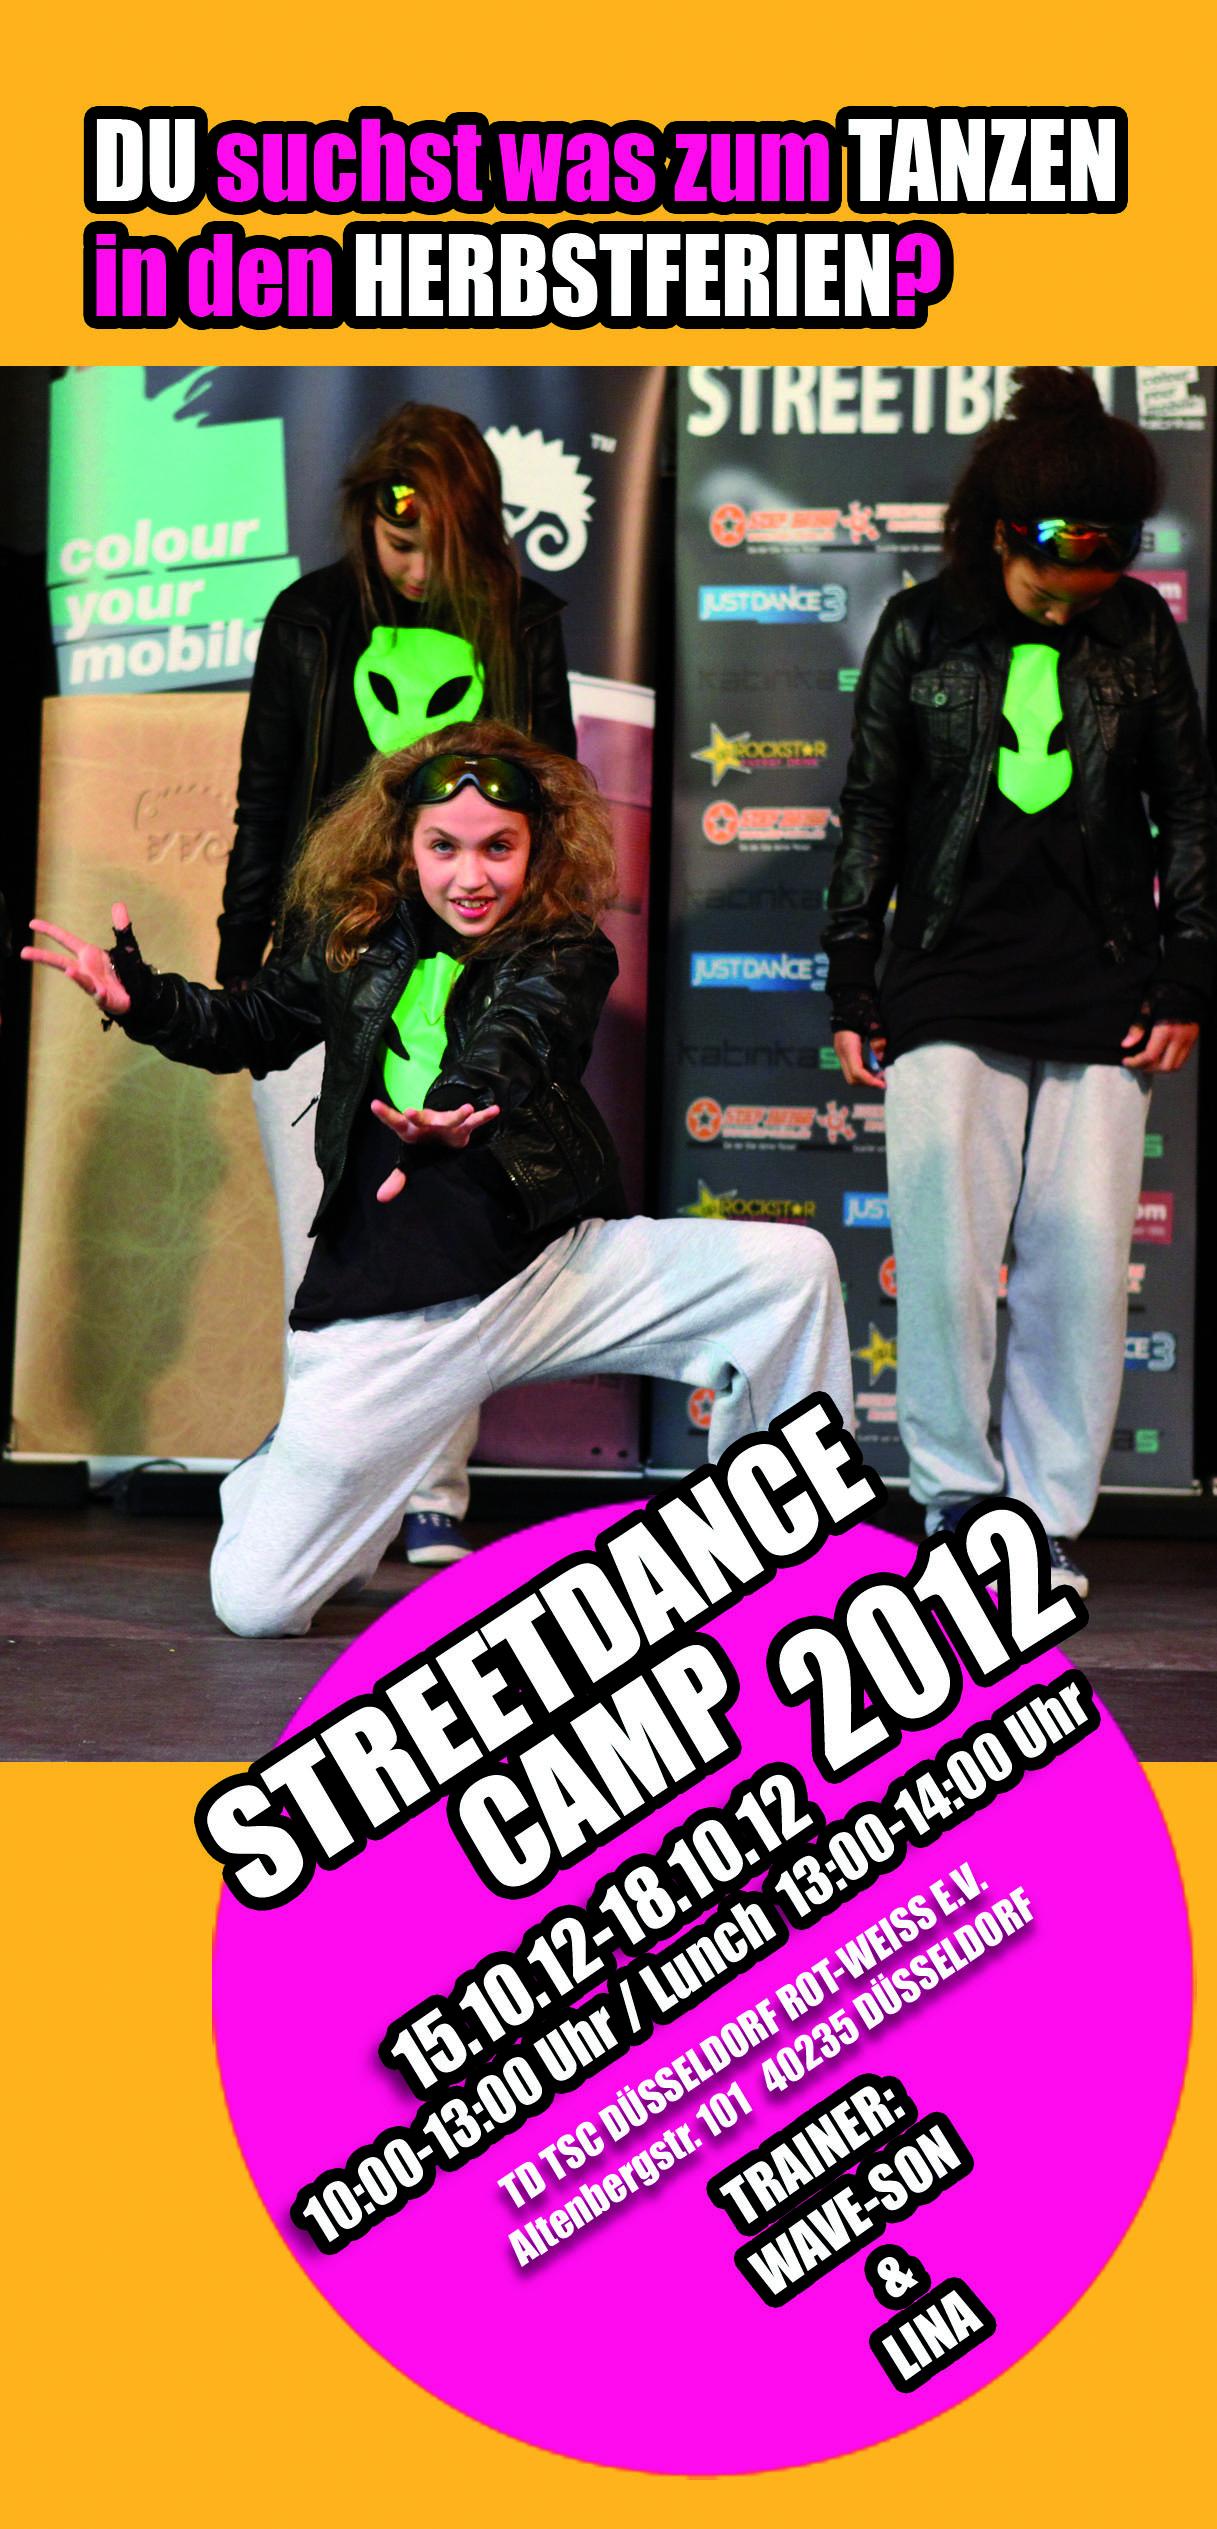 Streetdance Camp 2012